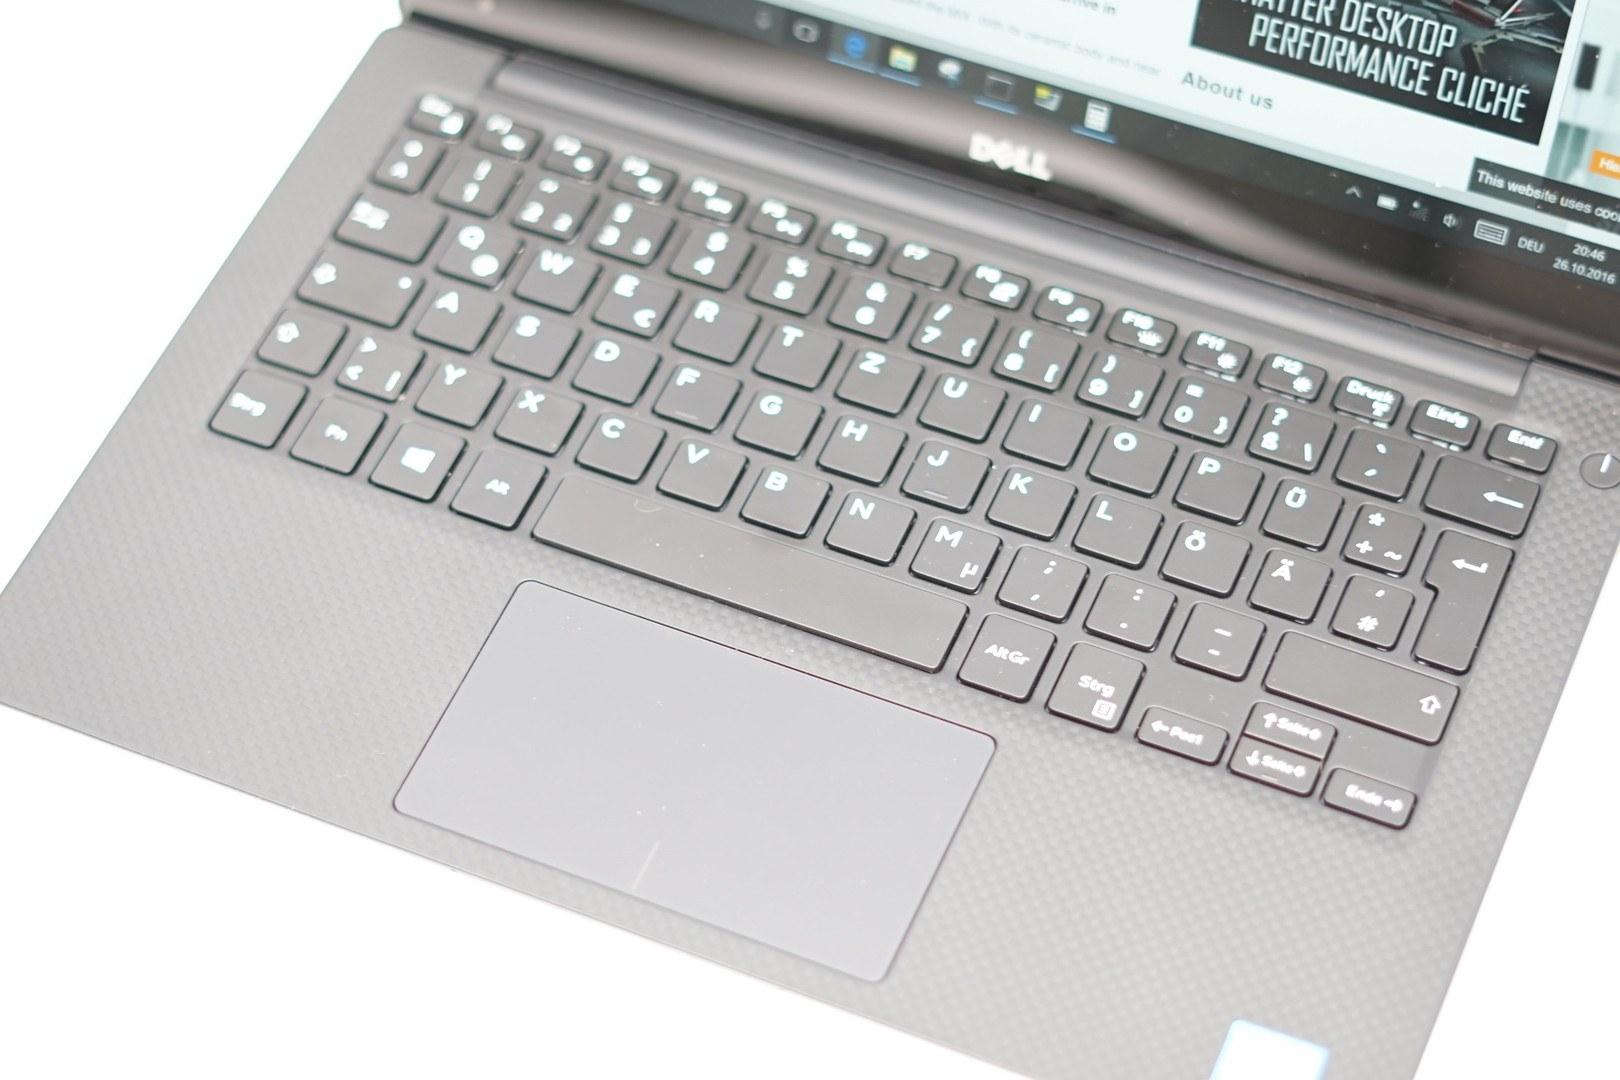 Dell XPS 13 9360 13.3 inch Windows 10